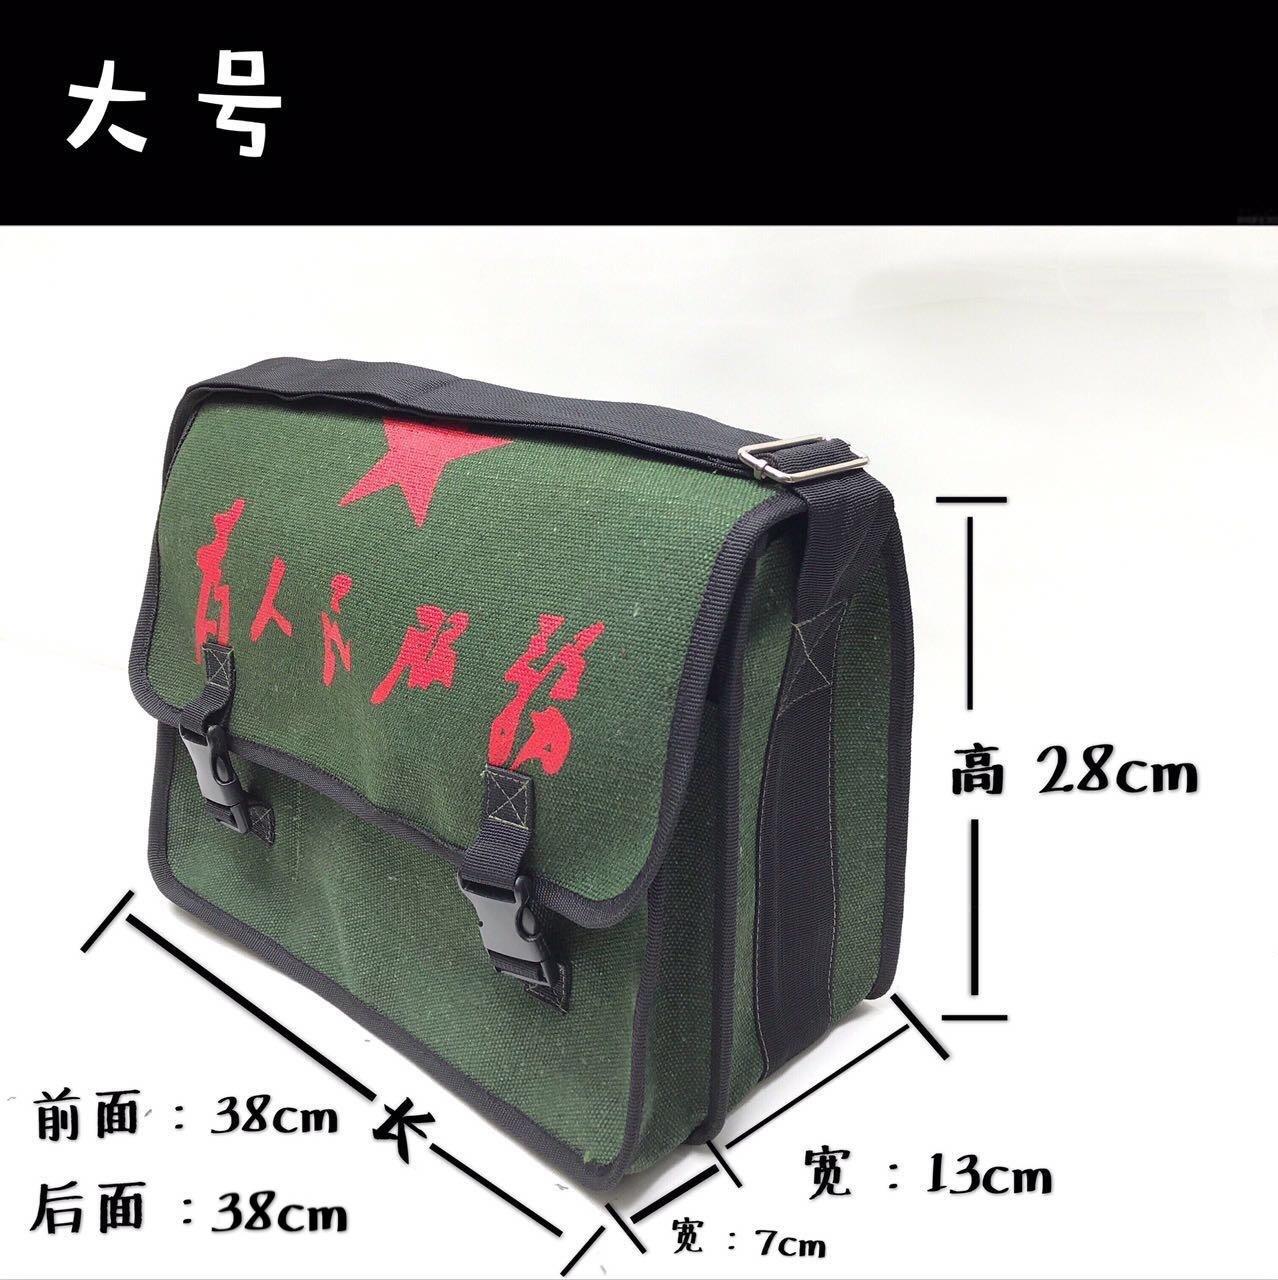 Thickened hand-held car bag hanging bag single shoulder labor protection canvas kit mens Wear-resistant bag with film